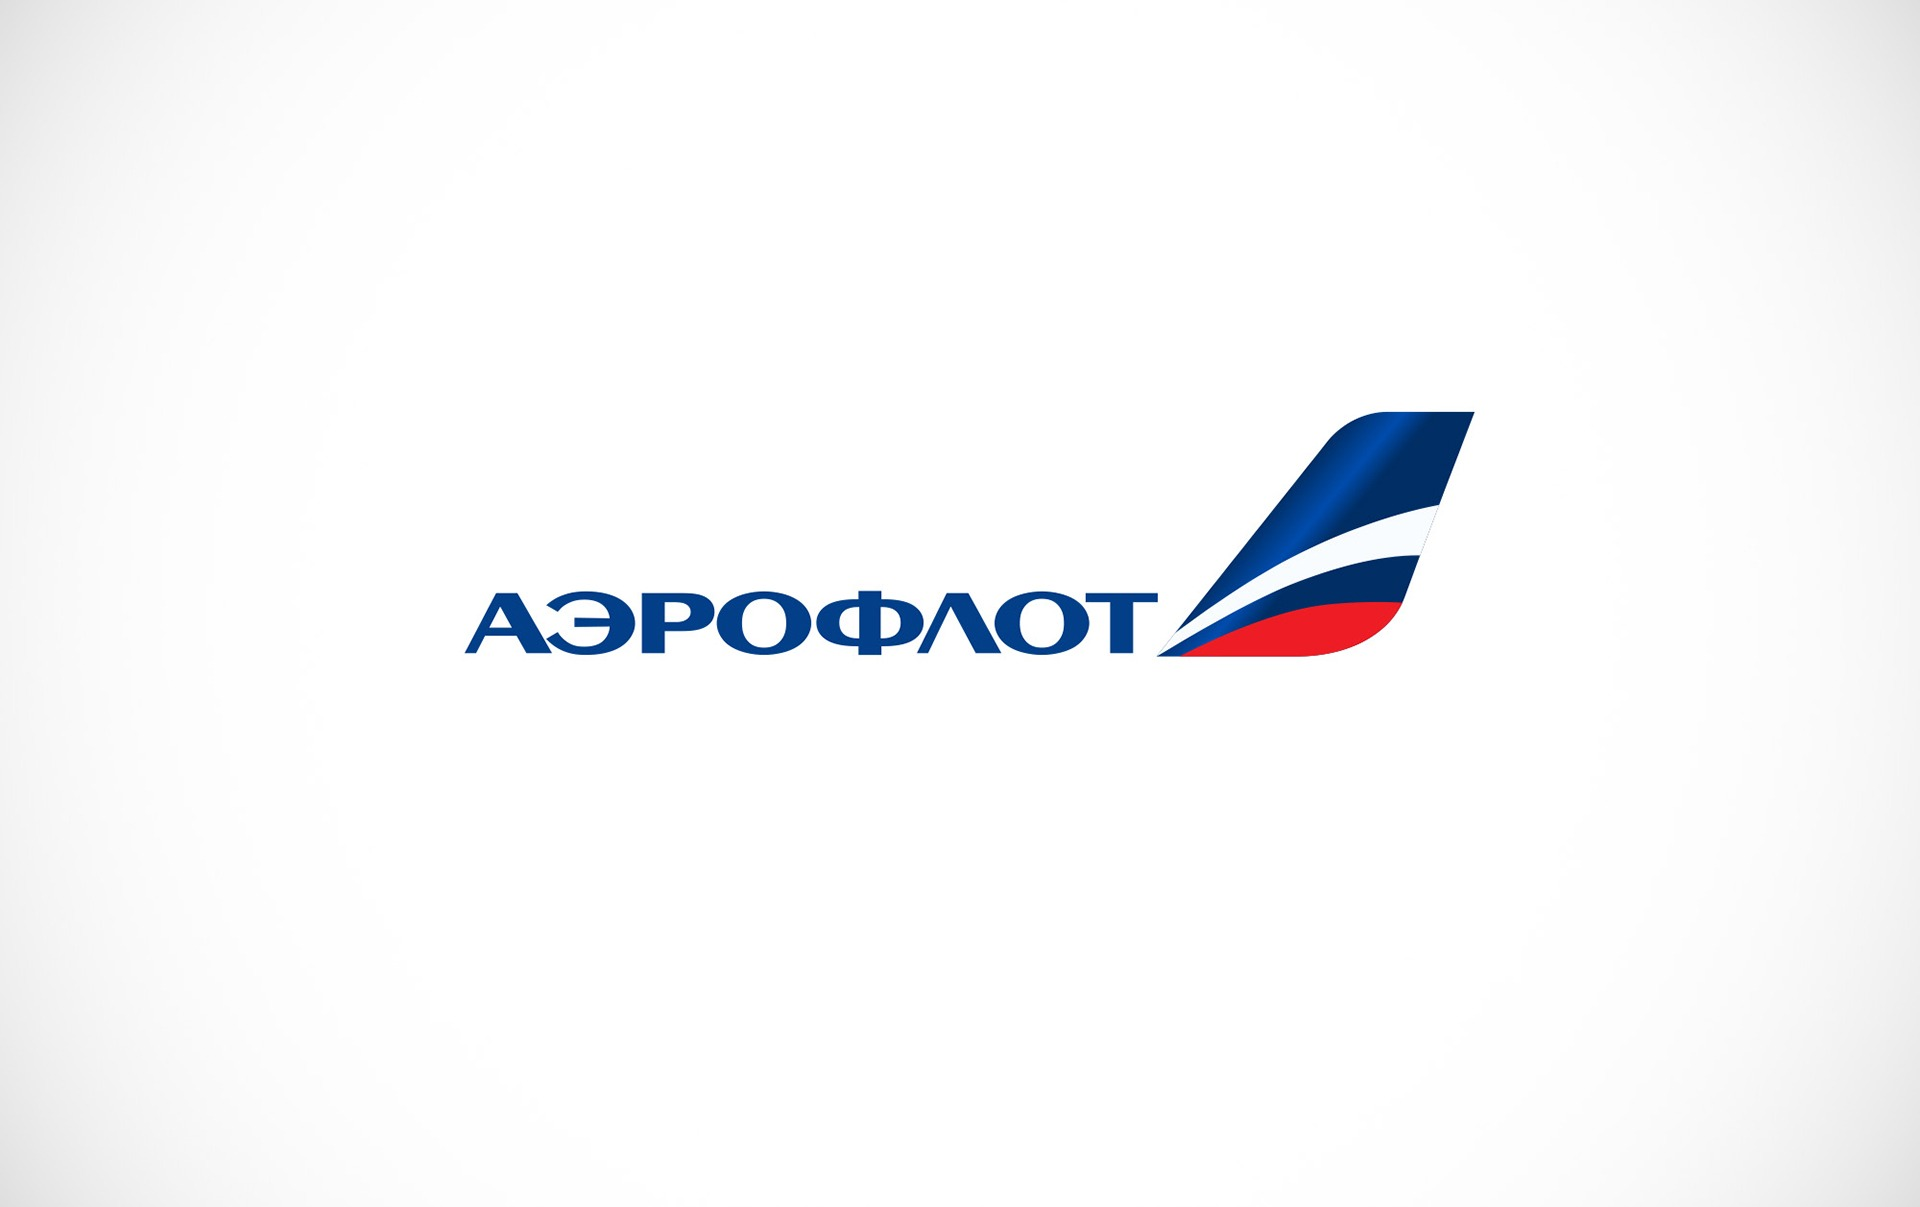 Aeroflot brand identity, брендинг авиакомпании,, re-branding, ребрендинг авиакомпании, Asgard Branding, лого Аэрофлот, logo